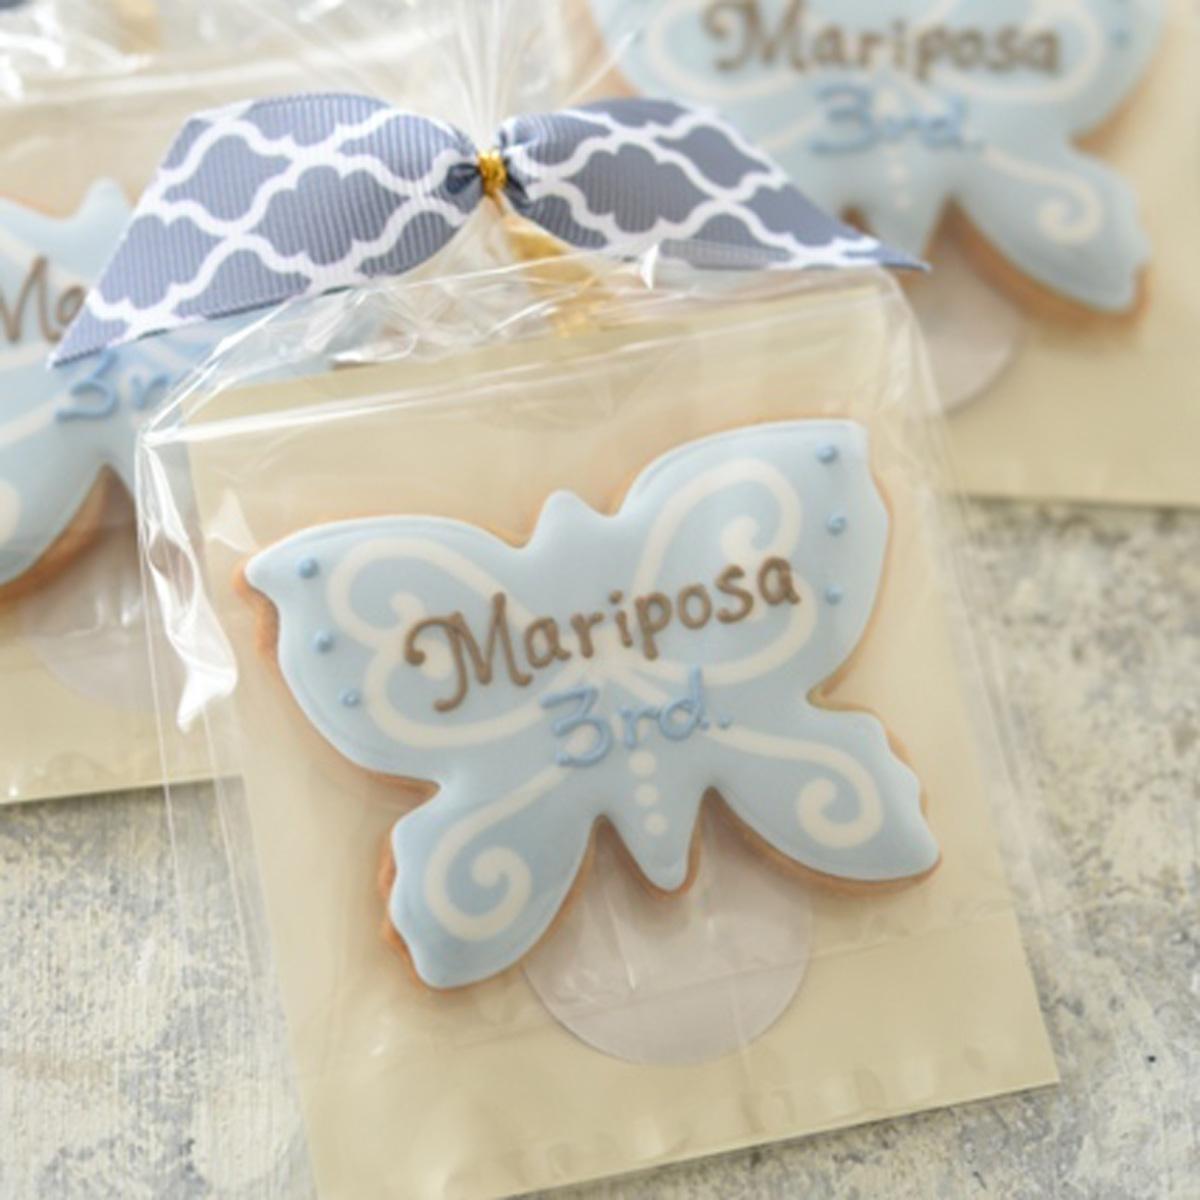 「Mariposa」3周年ノベルティクッキー